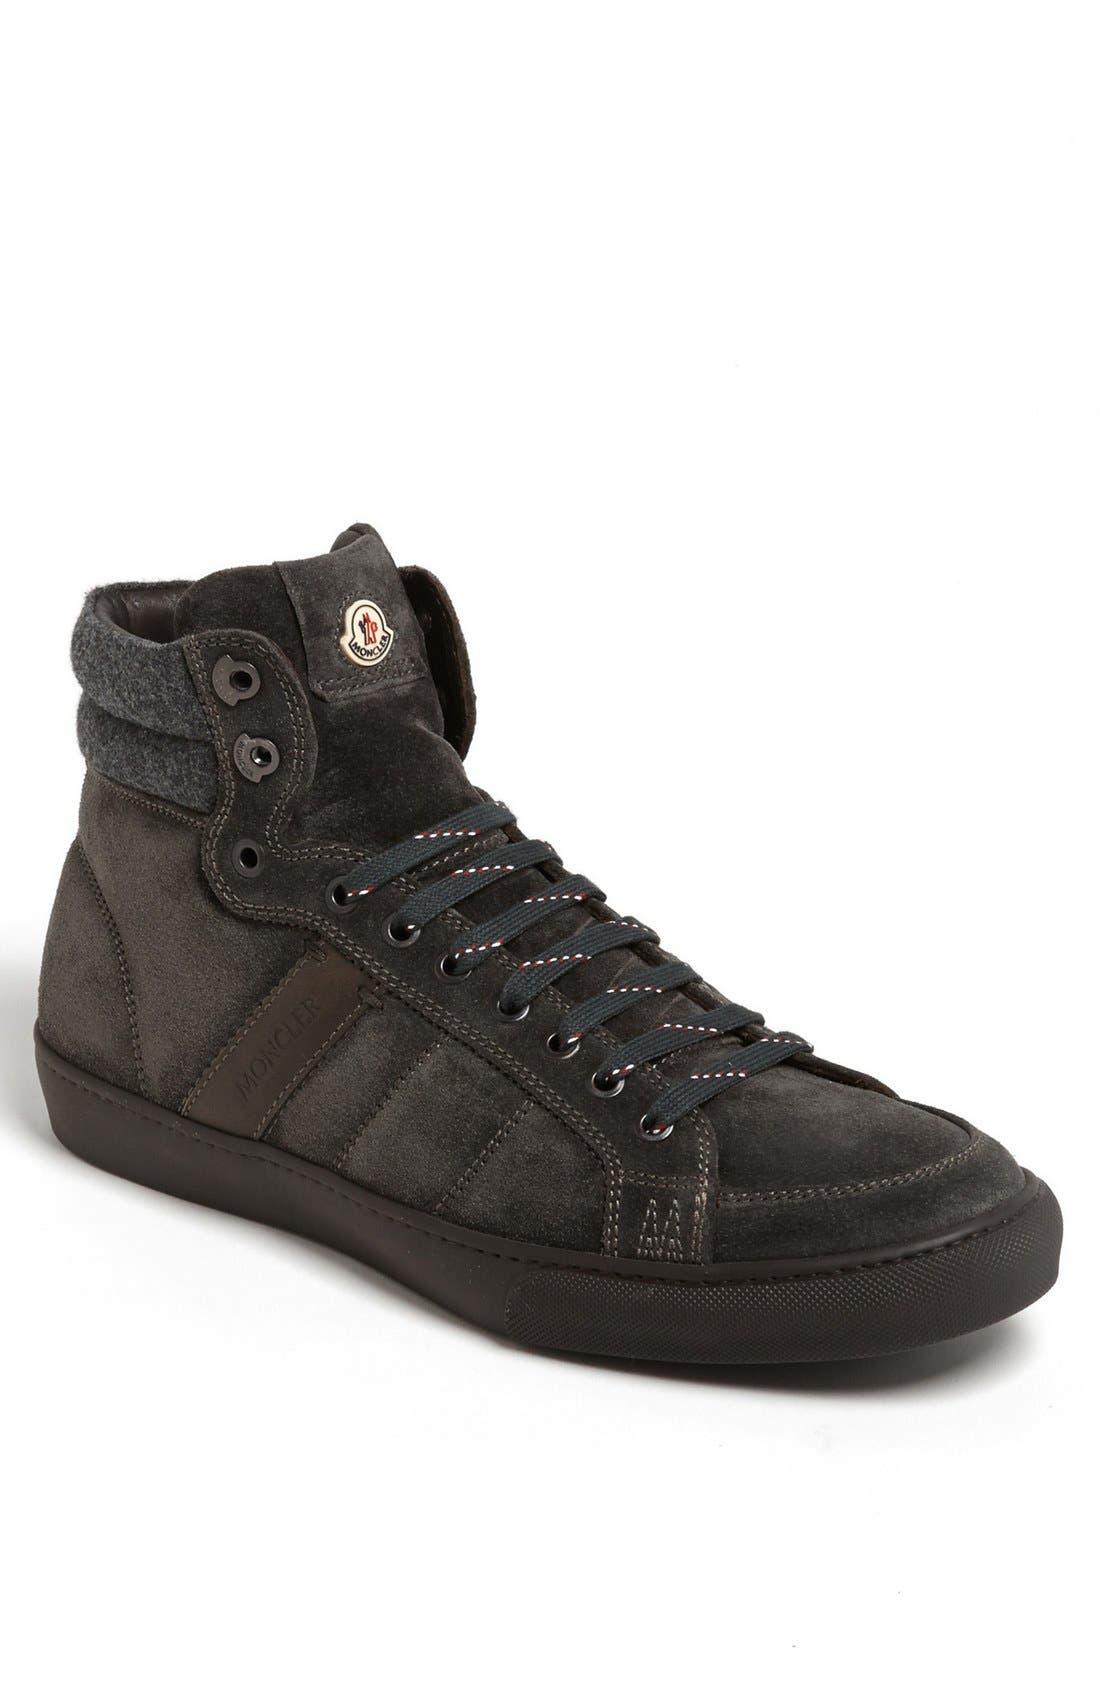 Alternate Image 1 Selected - Moncler 'Lyon' Suede Sneaker